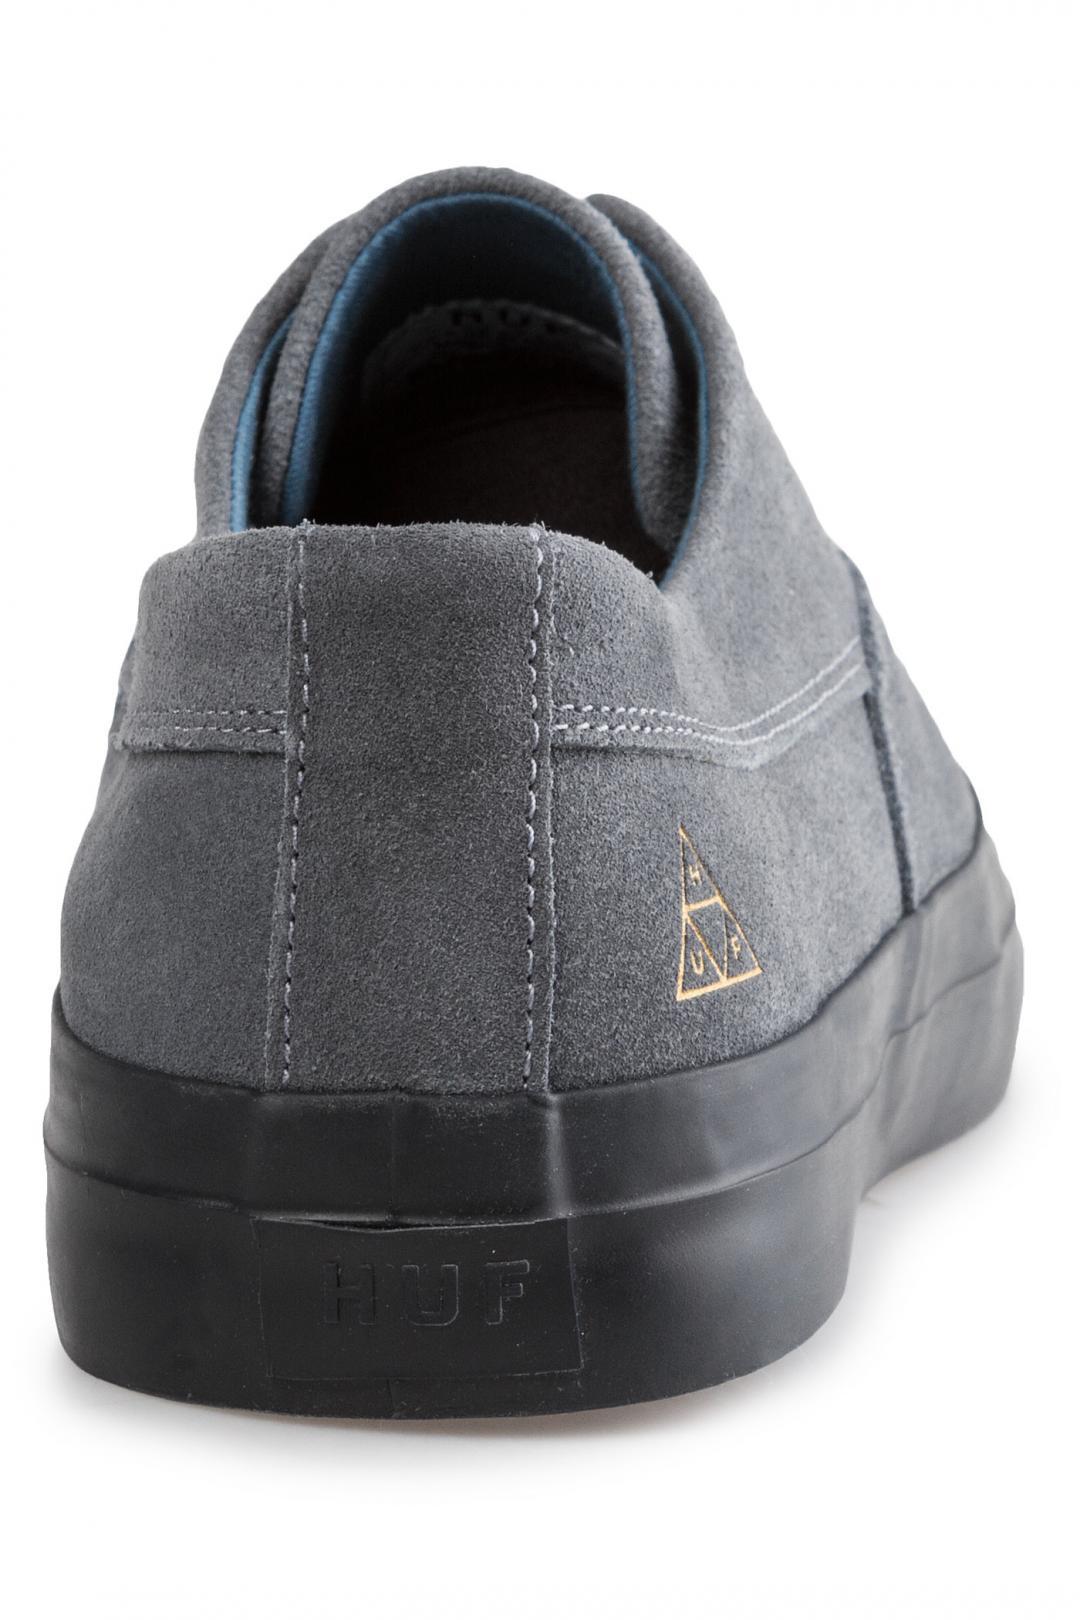 Uomo HUF Dylan Slip On blue stone   Sneaker